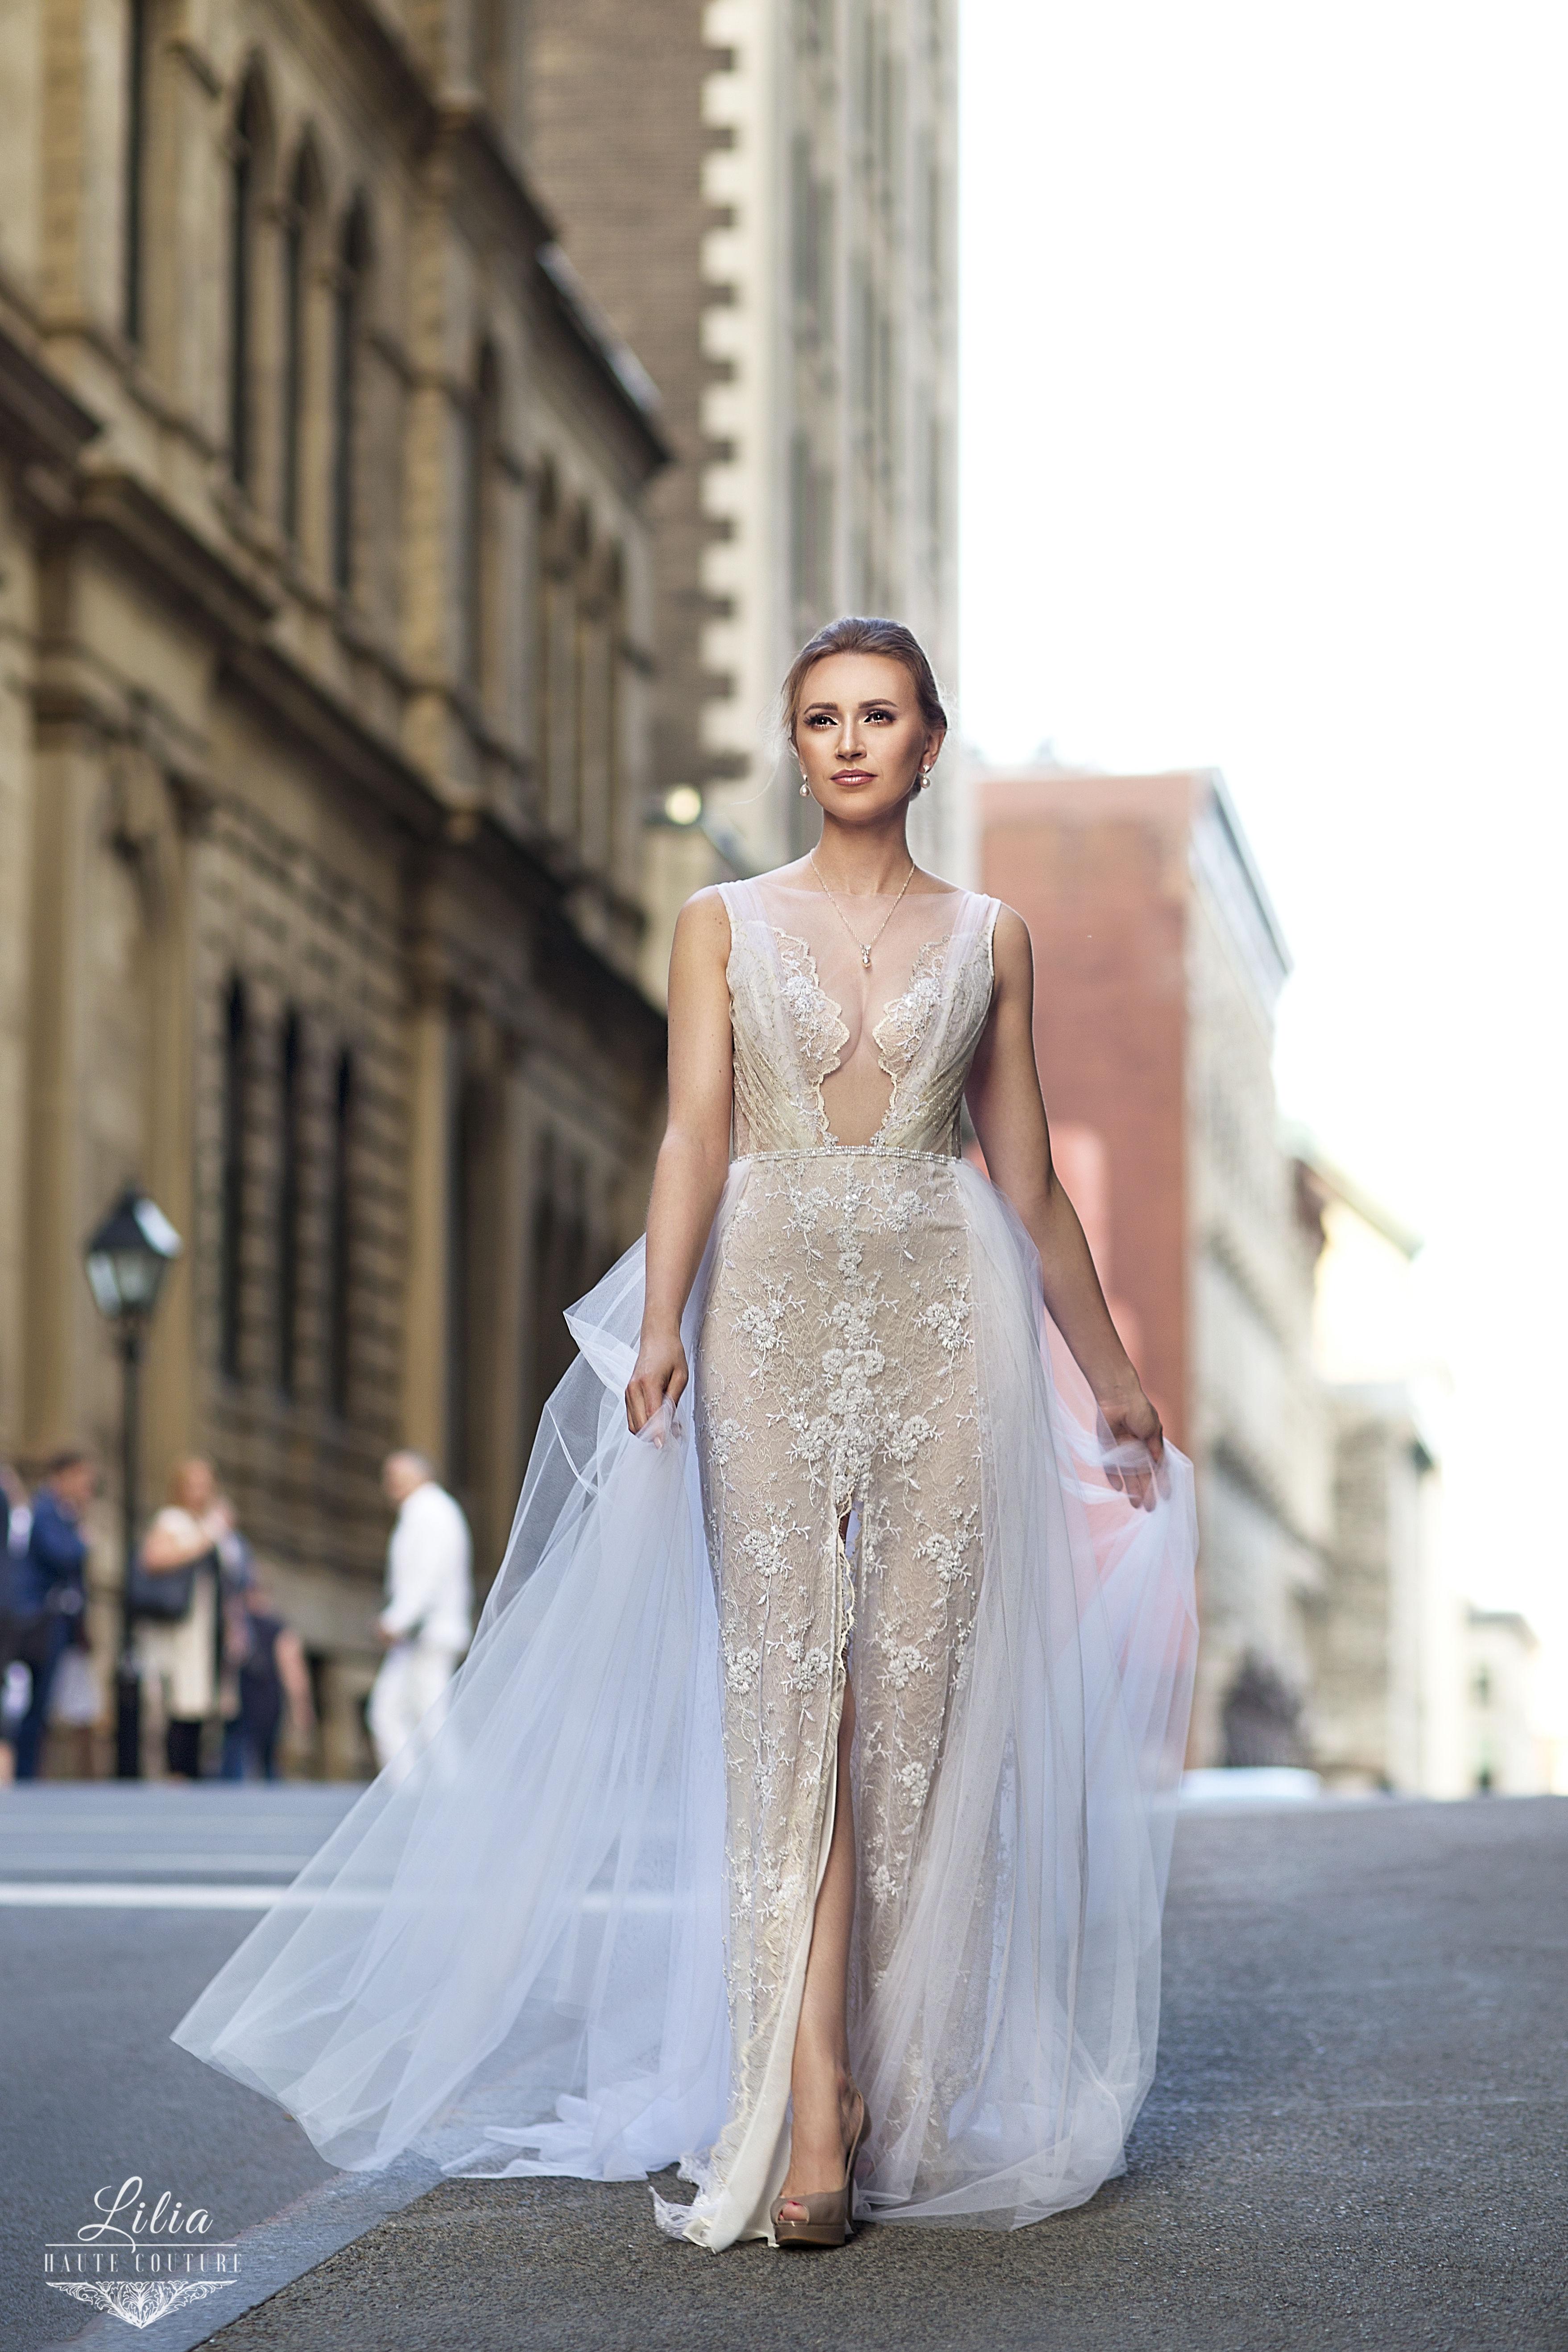 jupe en tulle avec ceinture perlee dentelle beige ivore robe lilia haute couture